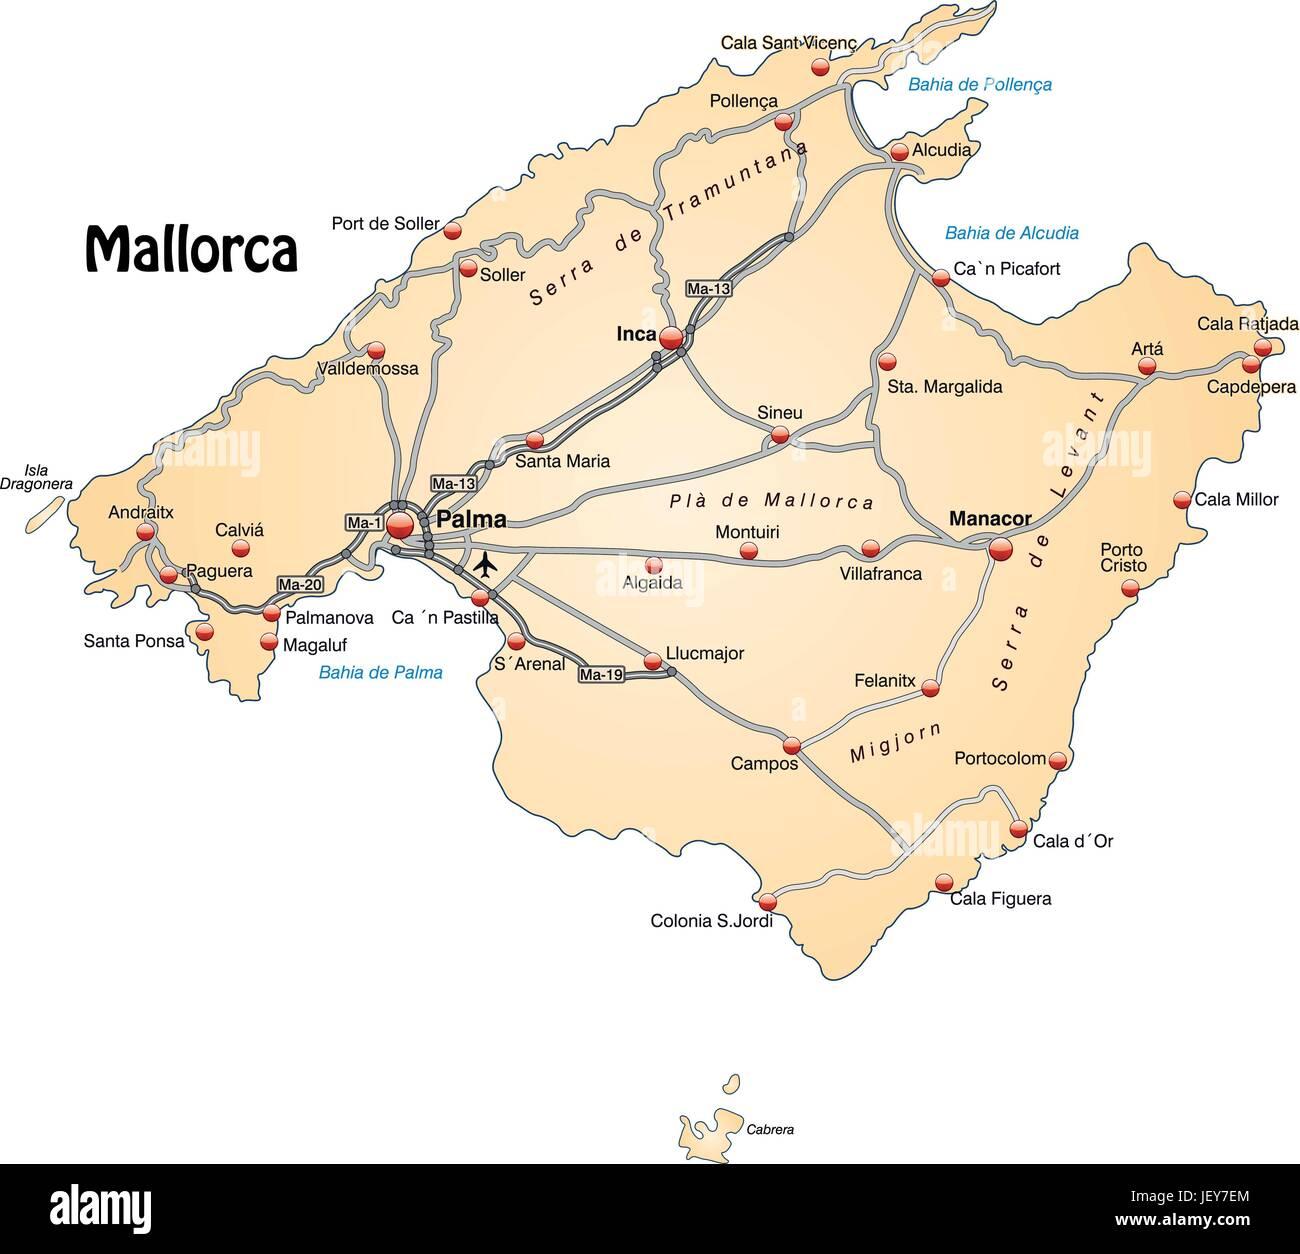 Card atlas map of the world map traffic transportation stock card atlas map of the world map traffic transportation mallorca gumiabroncs Choice Image